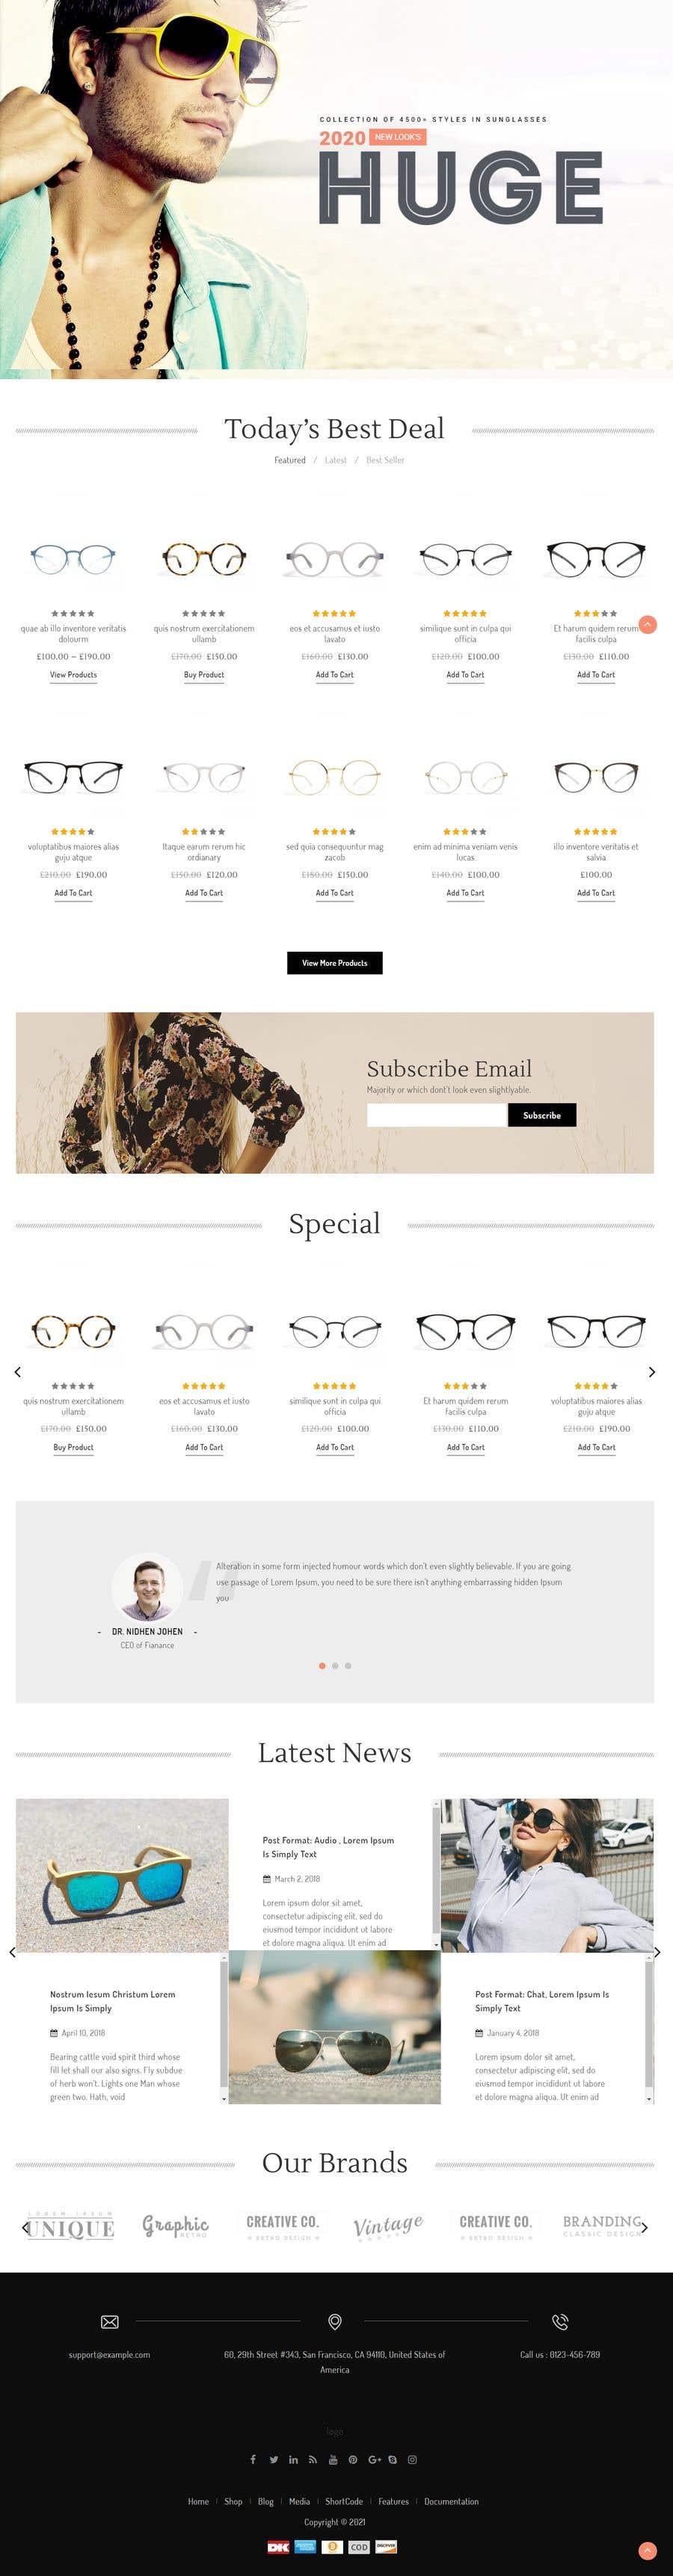 Konkurrenceindlæg #                                        50                                      for                                         Design an online shopping page for my website